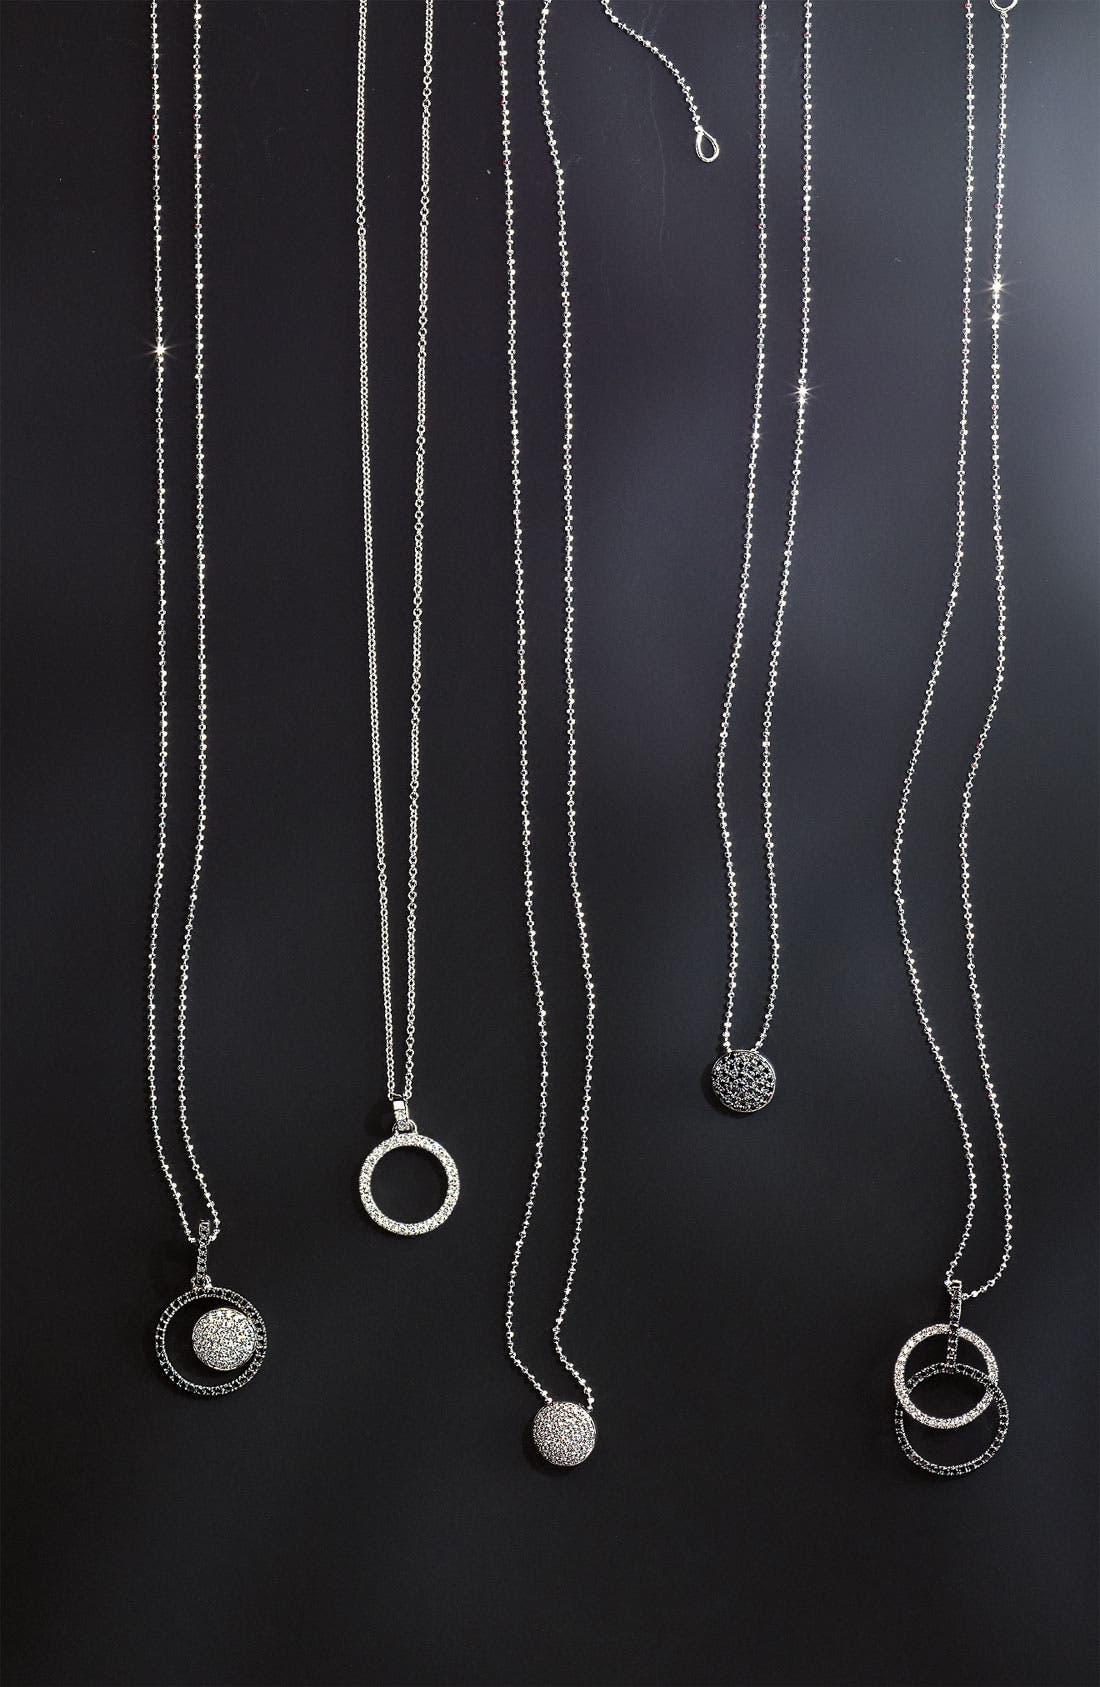 Alternate Image 3  - Bony Levy 'Circle Links' Diamond Pendant Necklace (Nordstrom Exclusive)